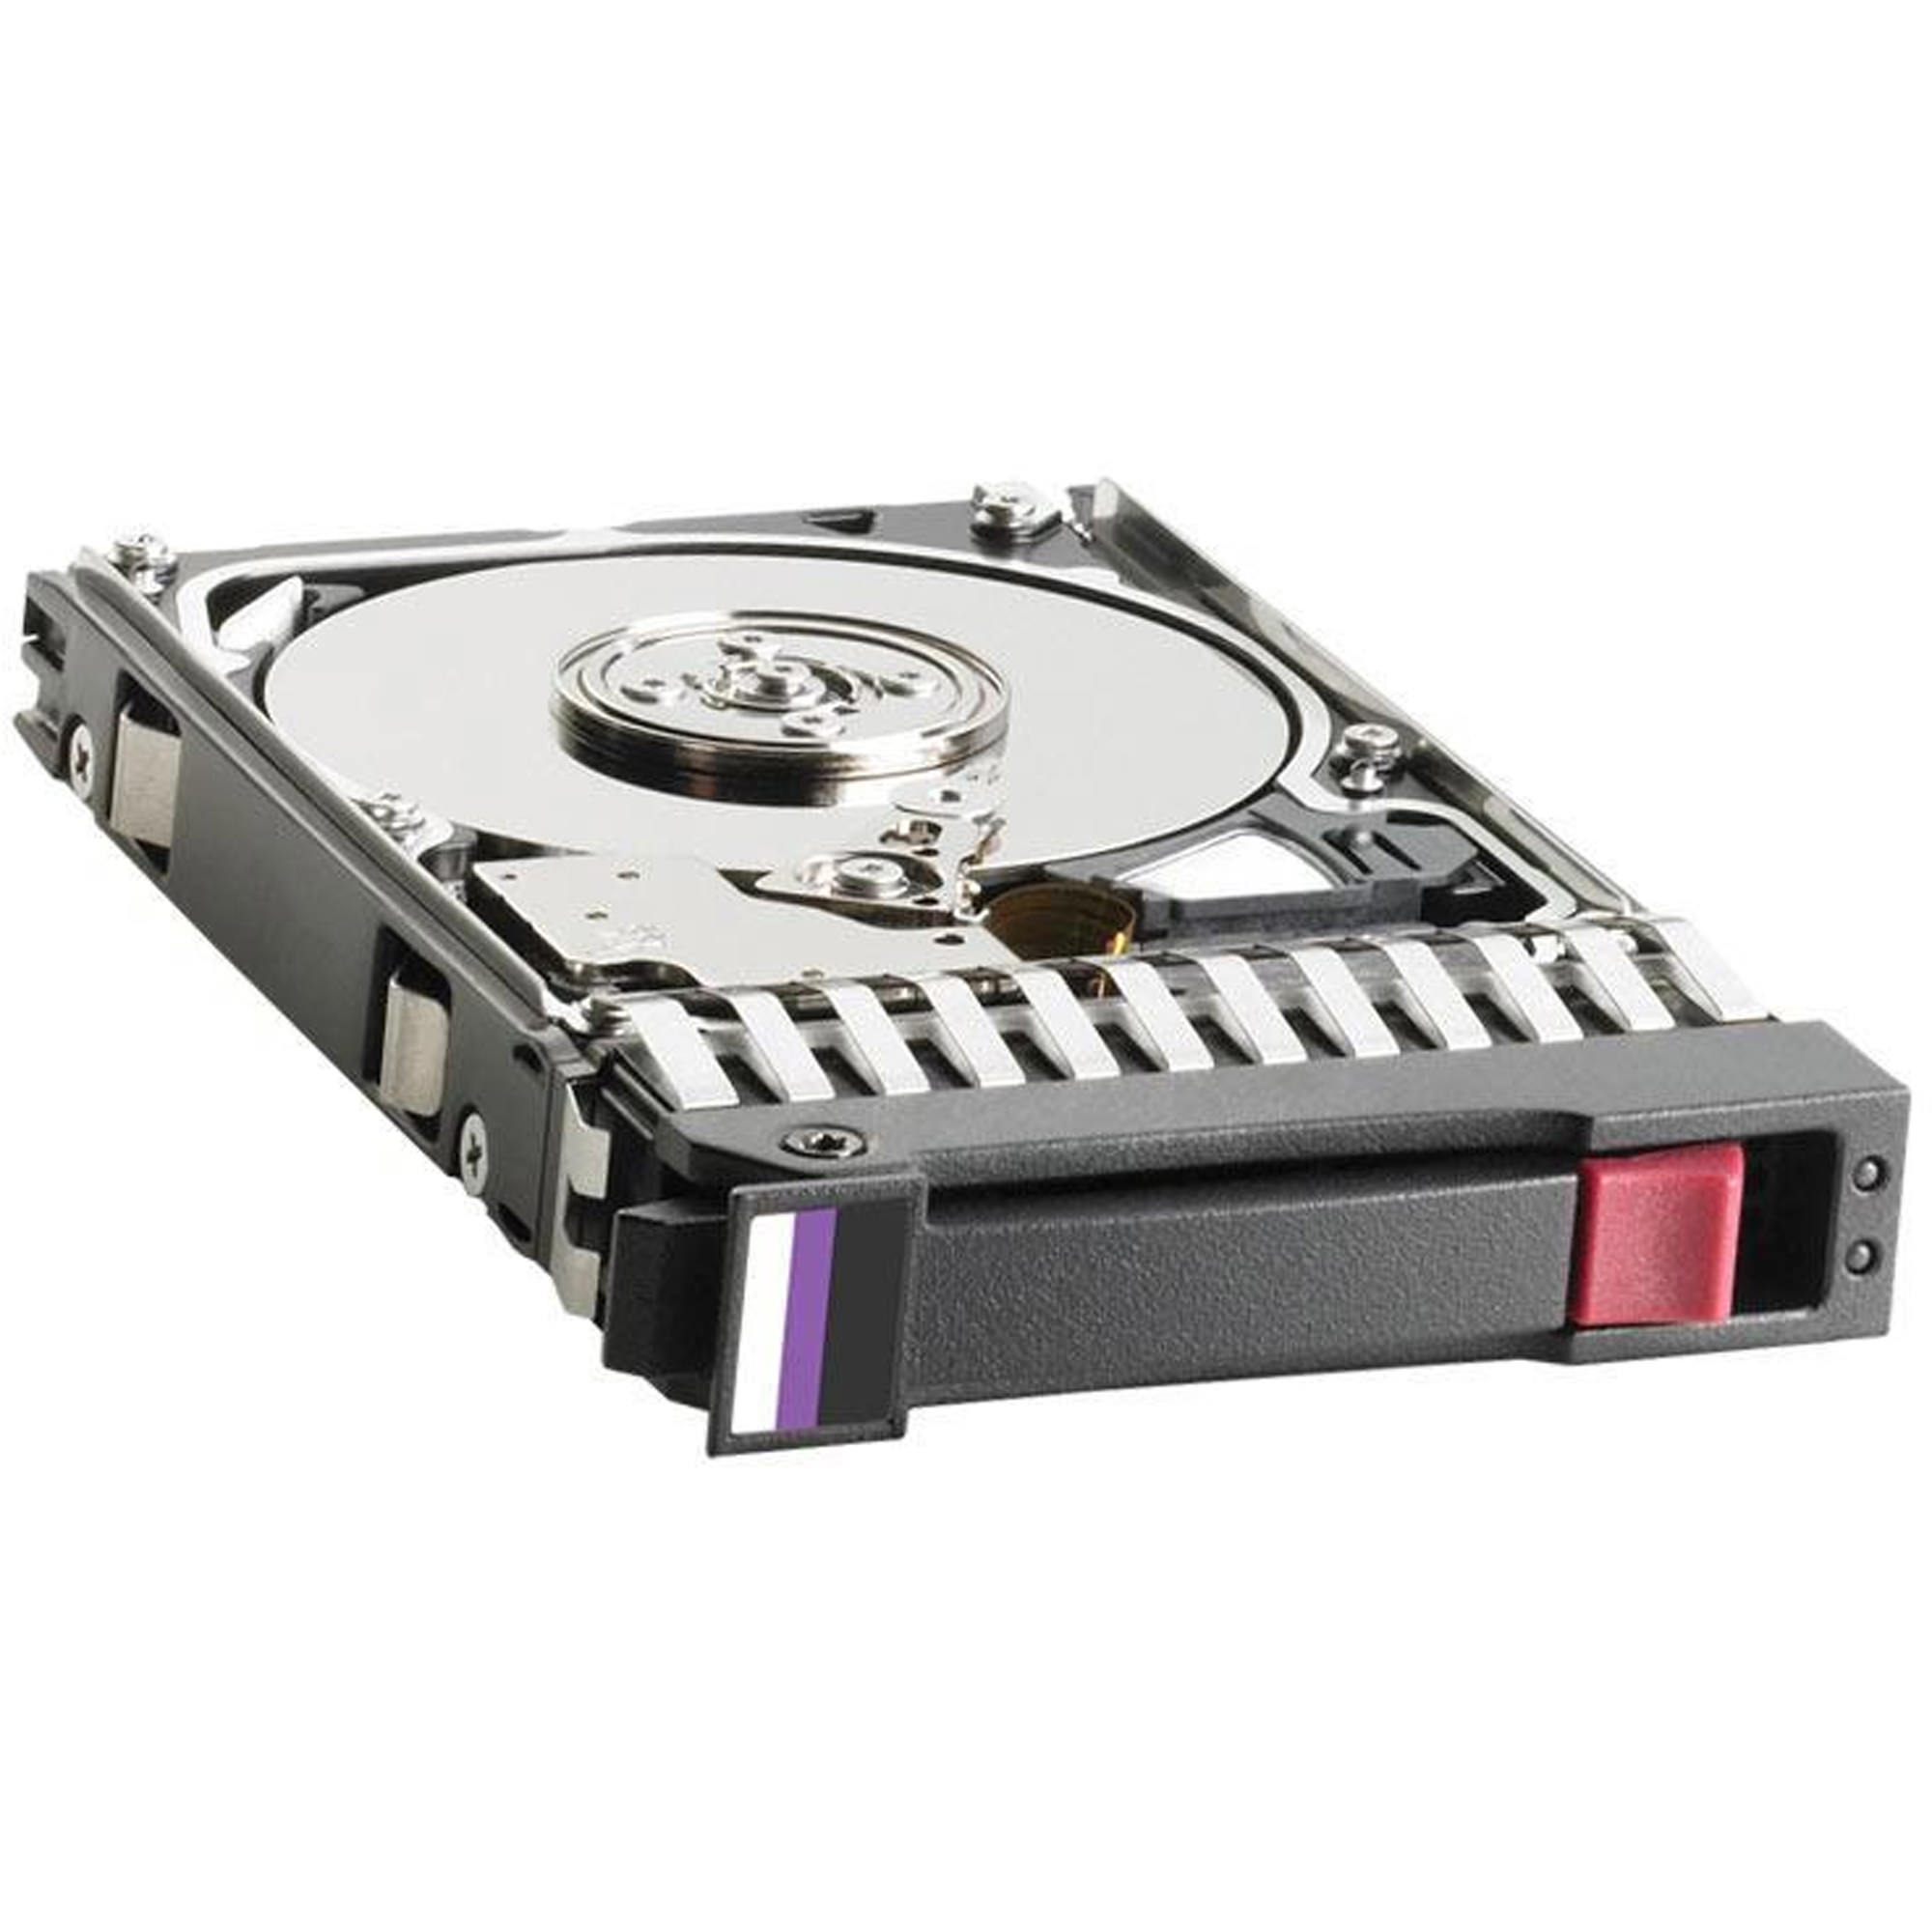 HPE MSA 600GB 12G SAS 10K 2.5IN HDD